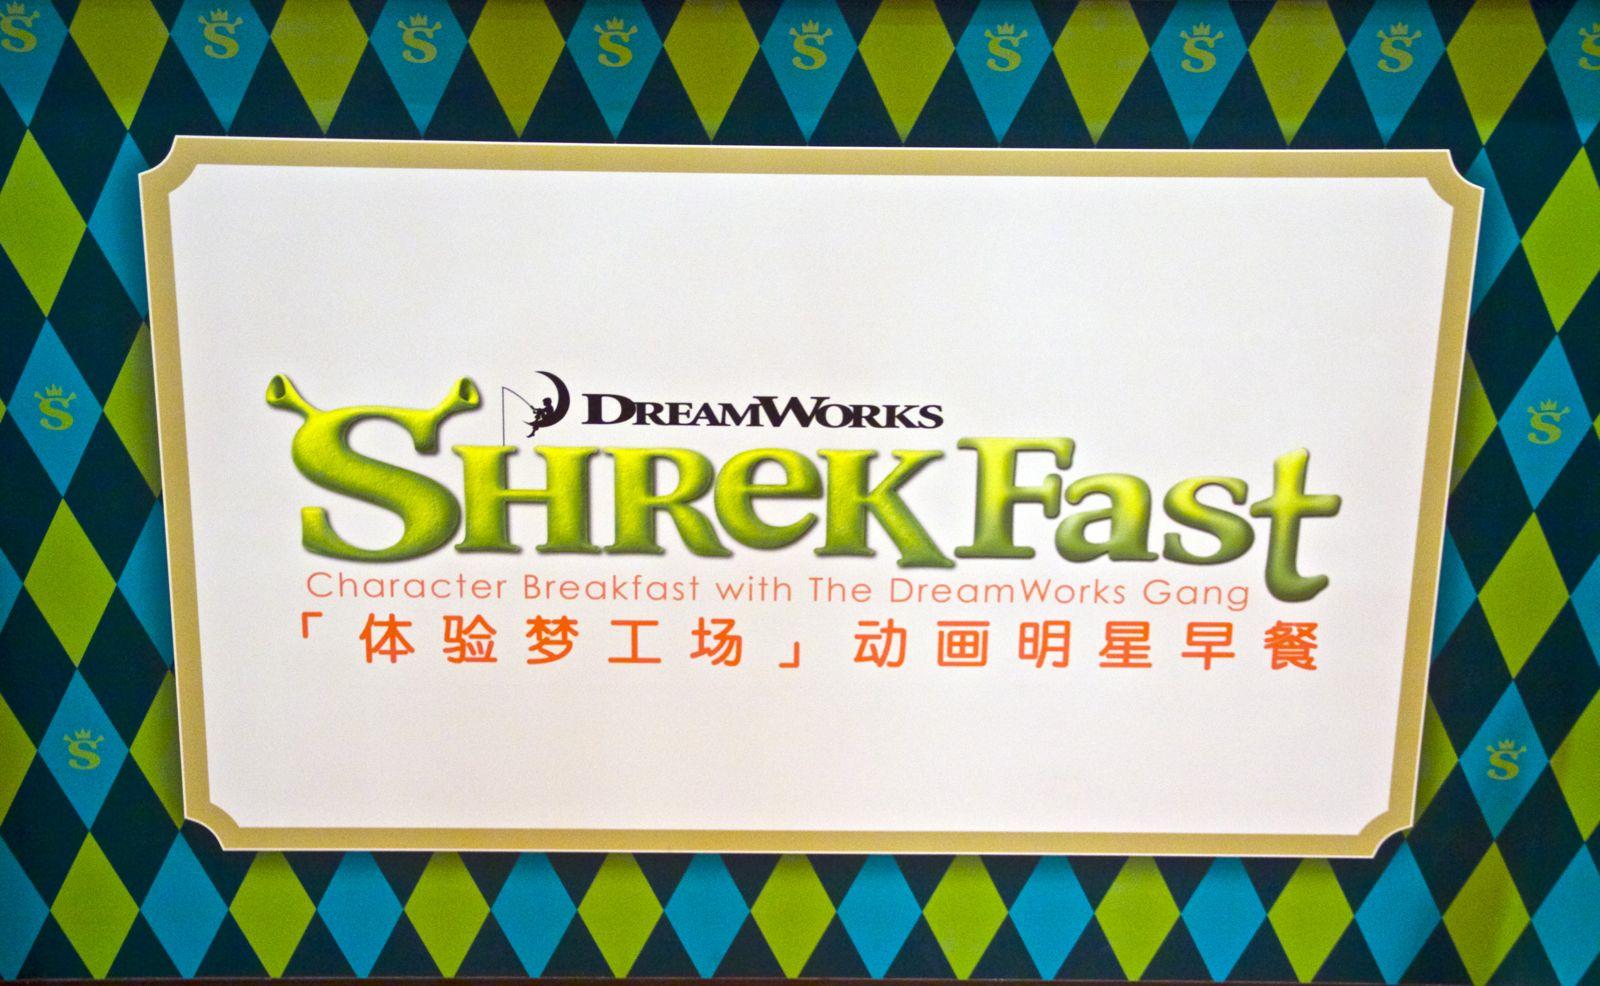 Shrekfast in Macau